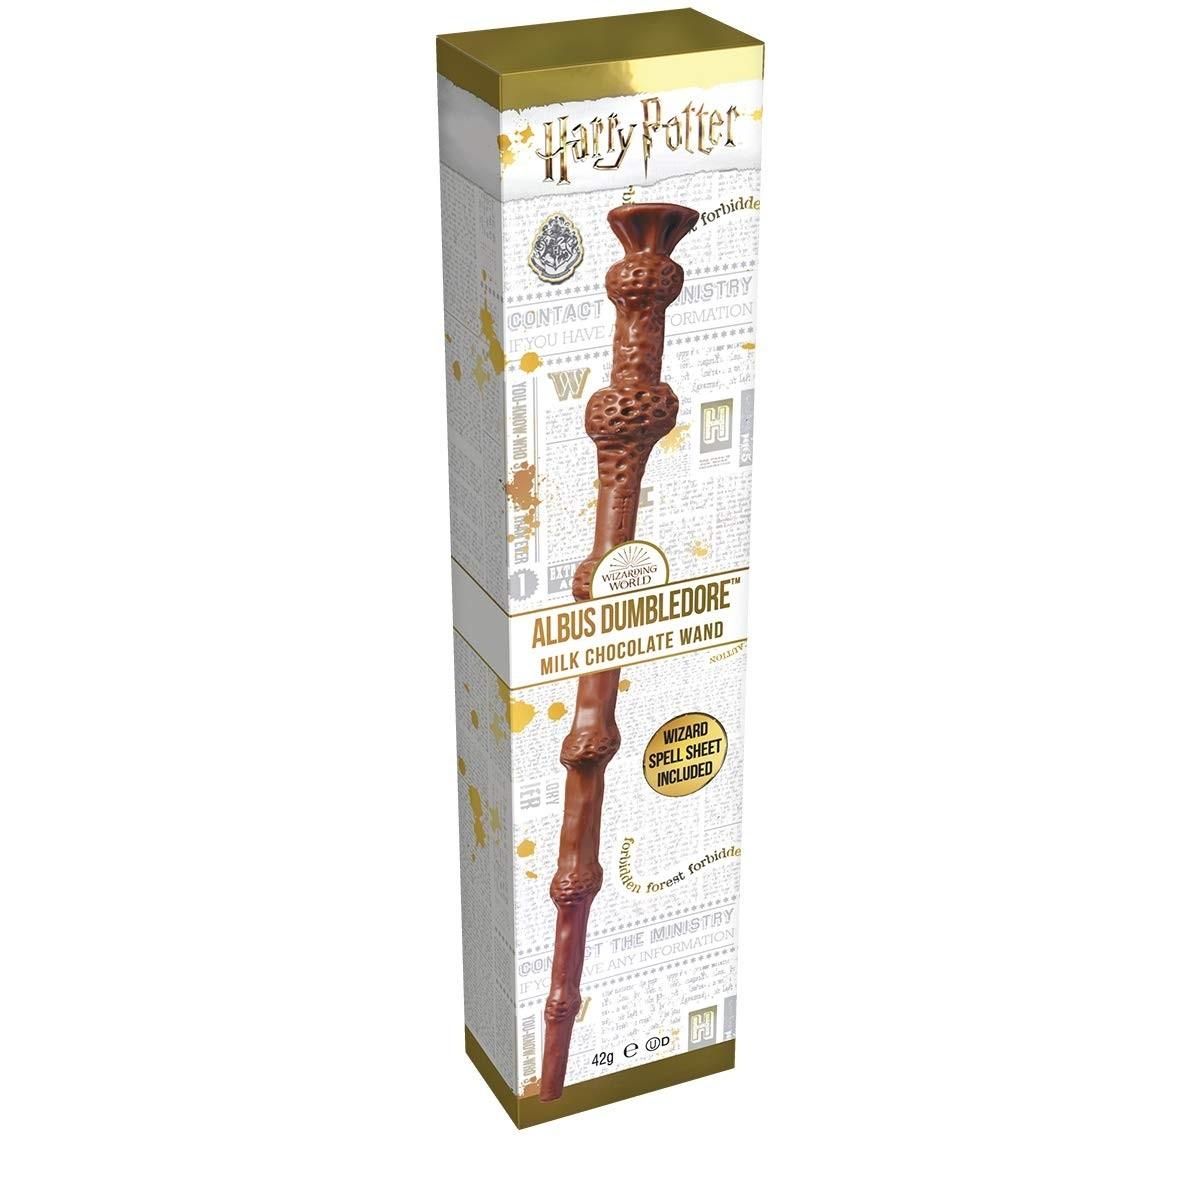 Albus Dumbledore's Milk Chocolate Wand